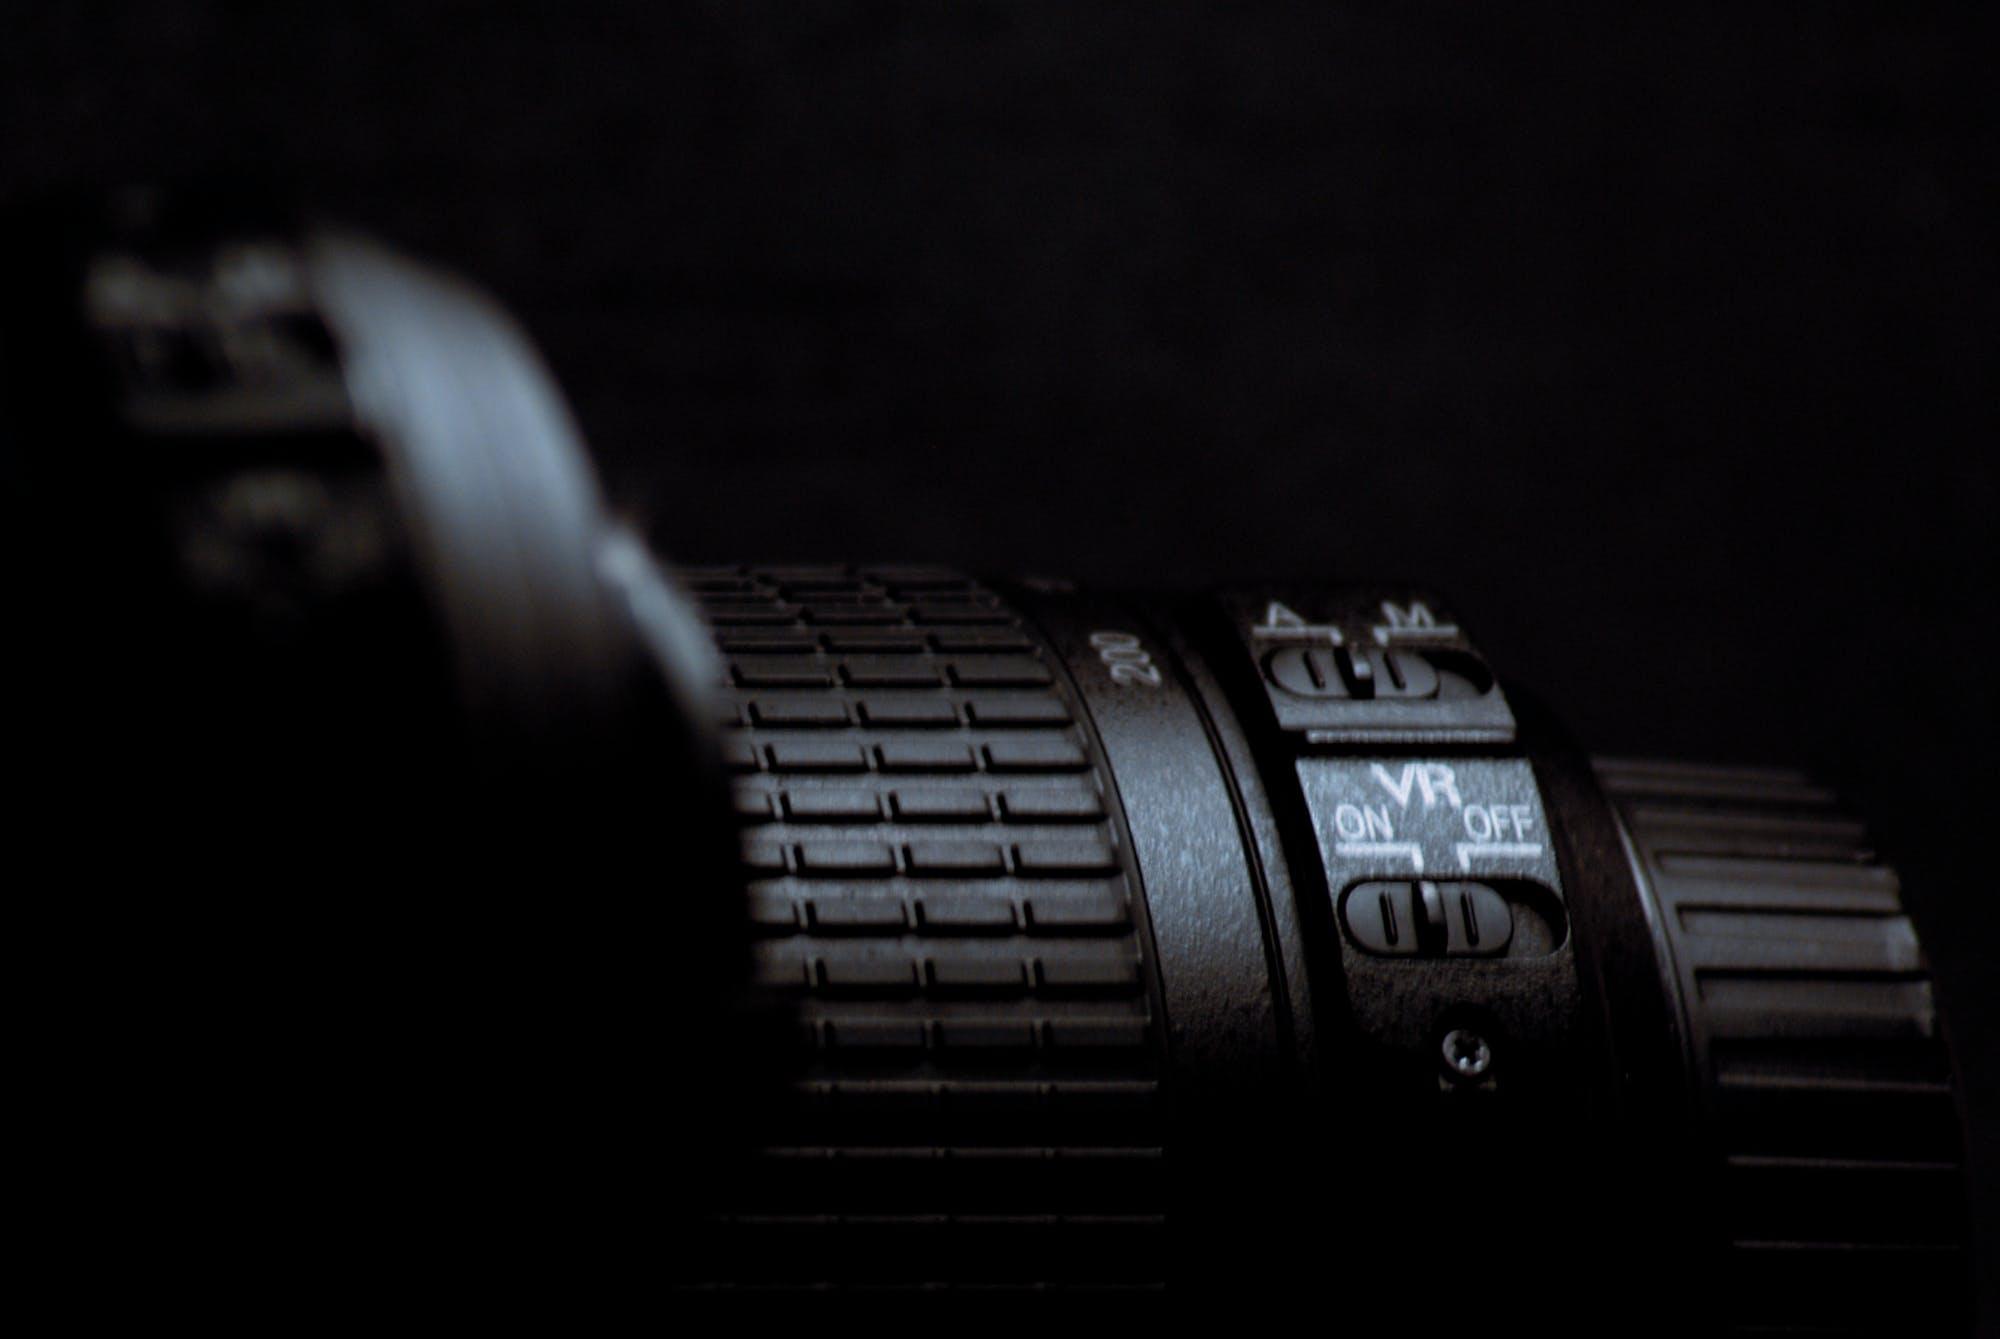 Free stock photo of nikon lens camera